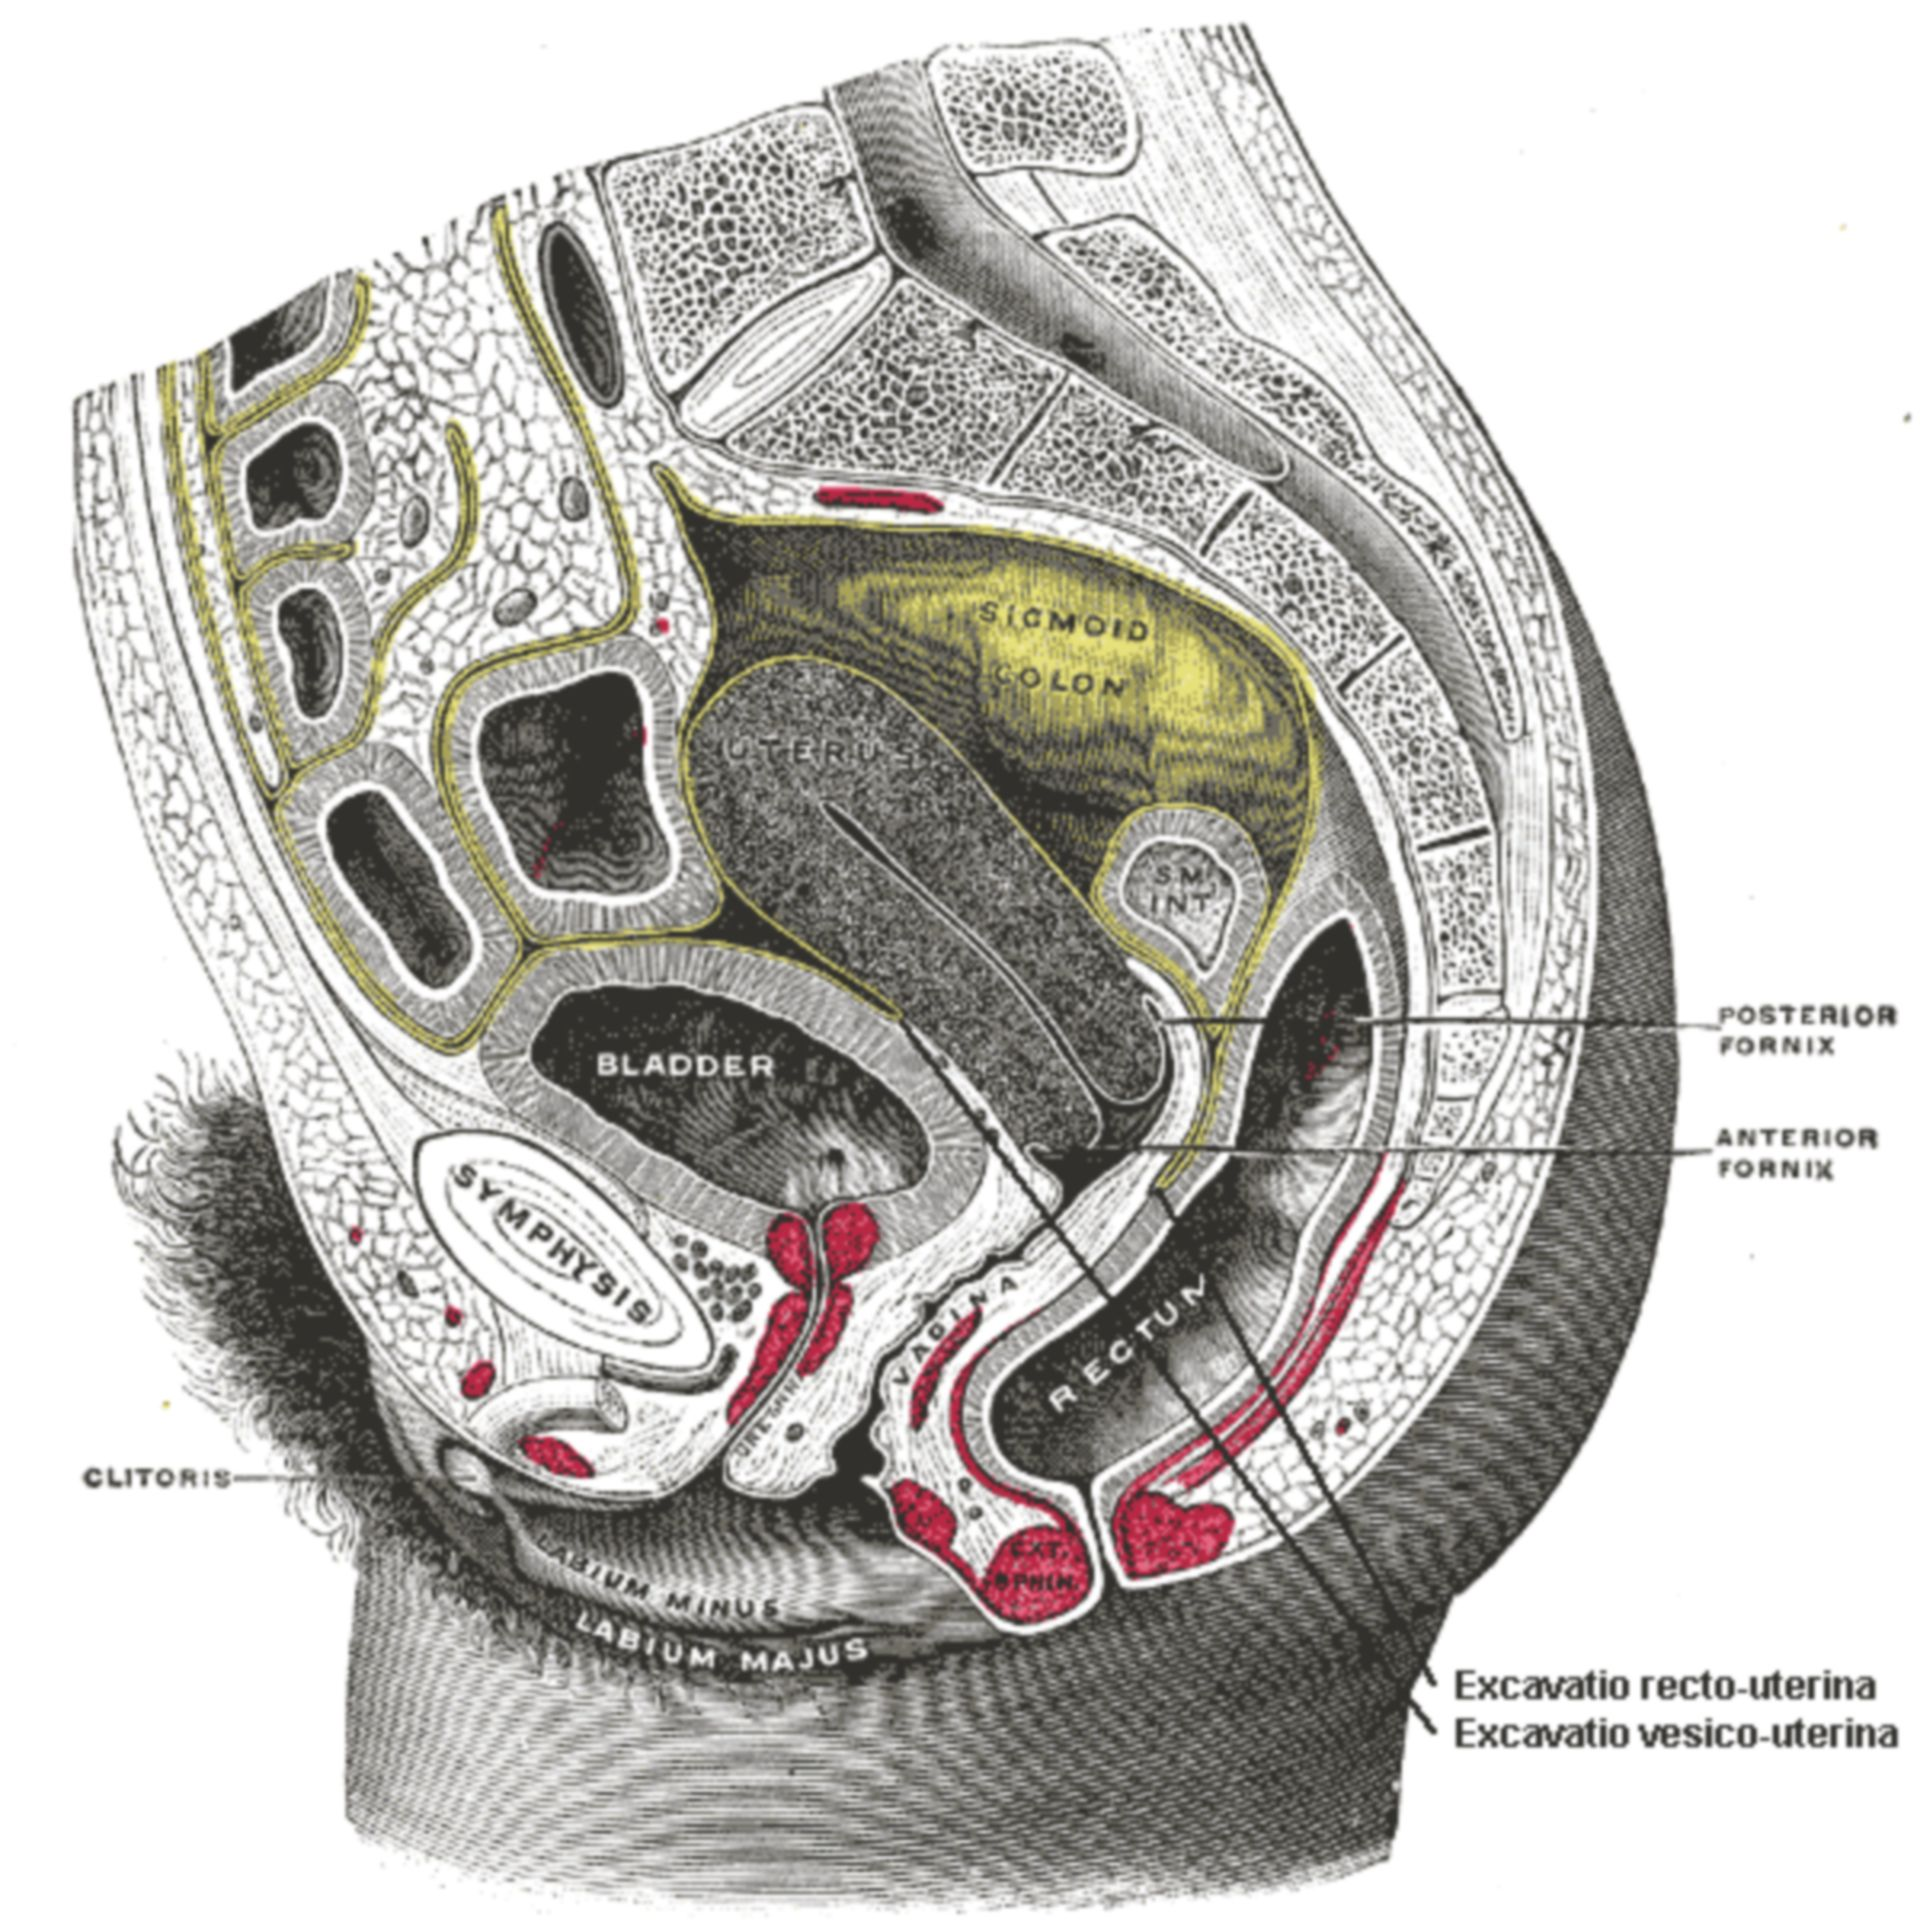 Anatomy of the female pelvis (media section)